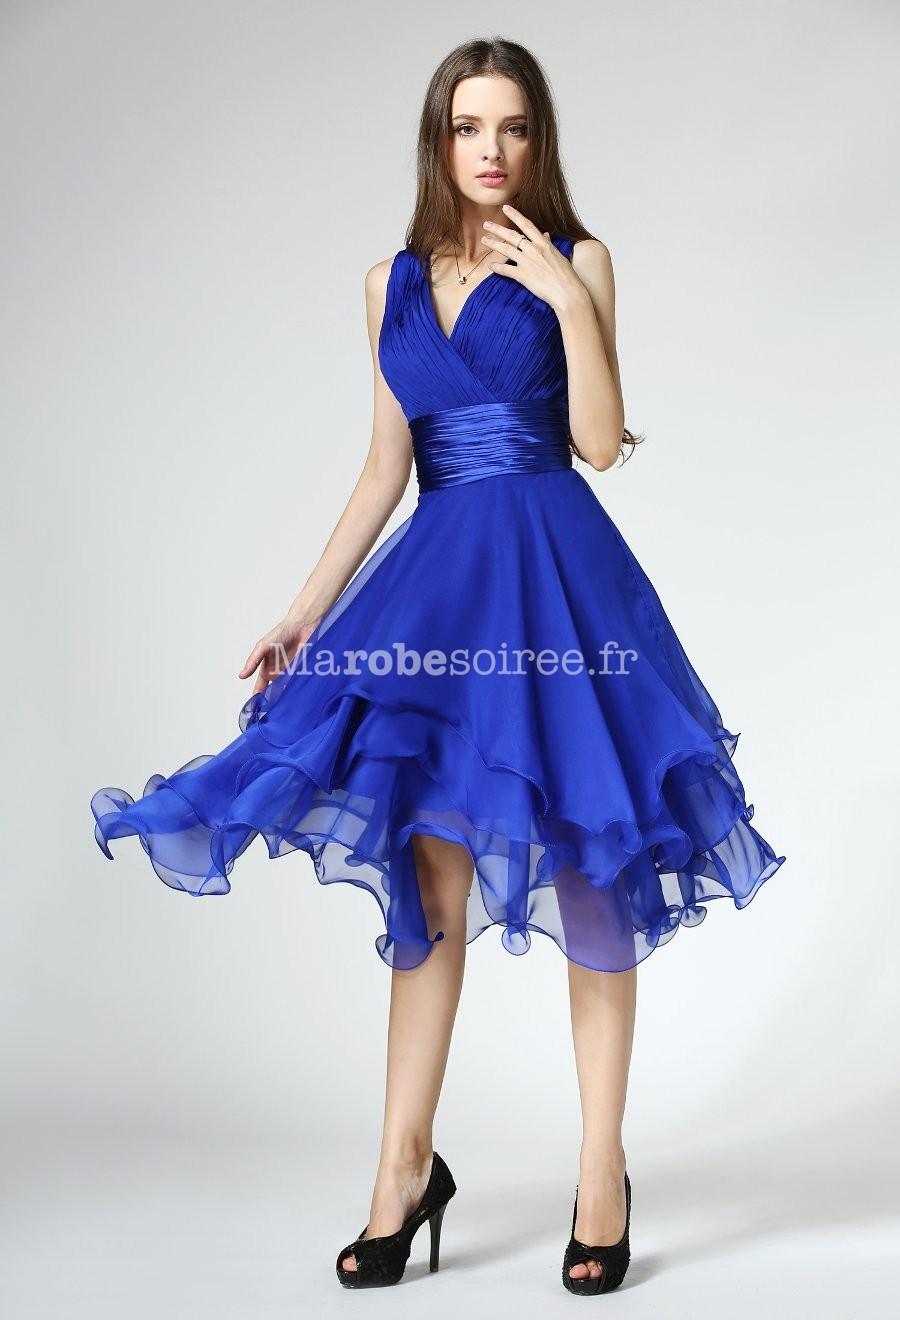 Robe bleu ciel courte fashion designs for Robes bleu ciel pour un mariage